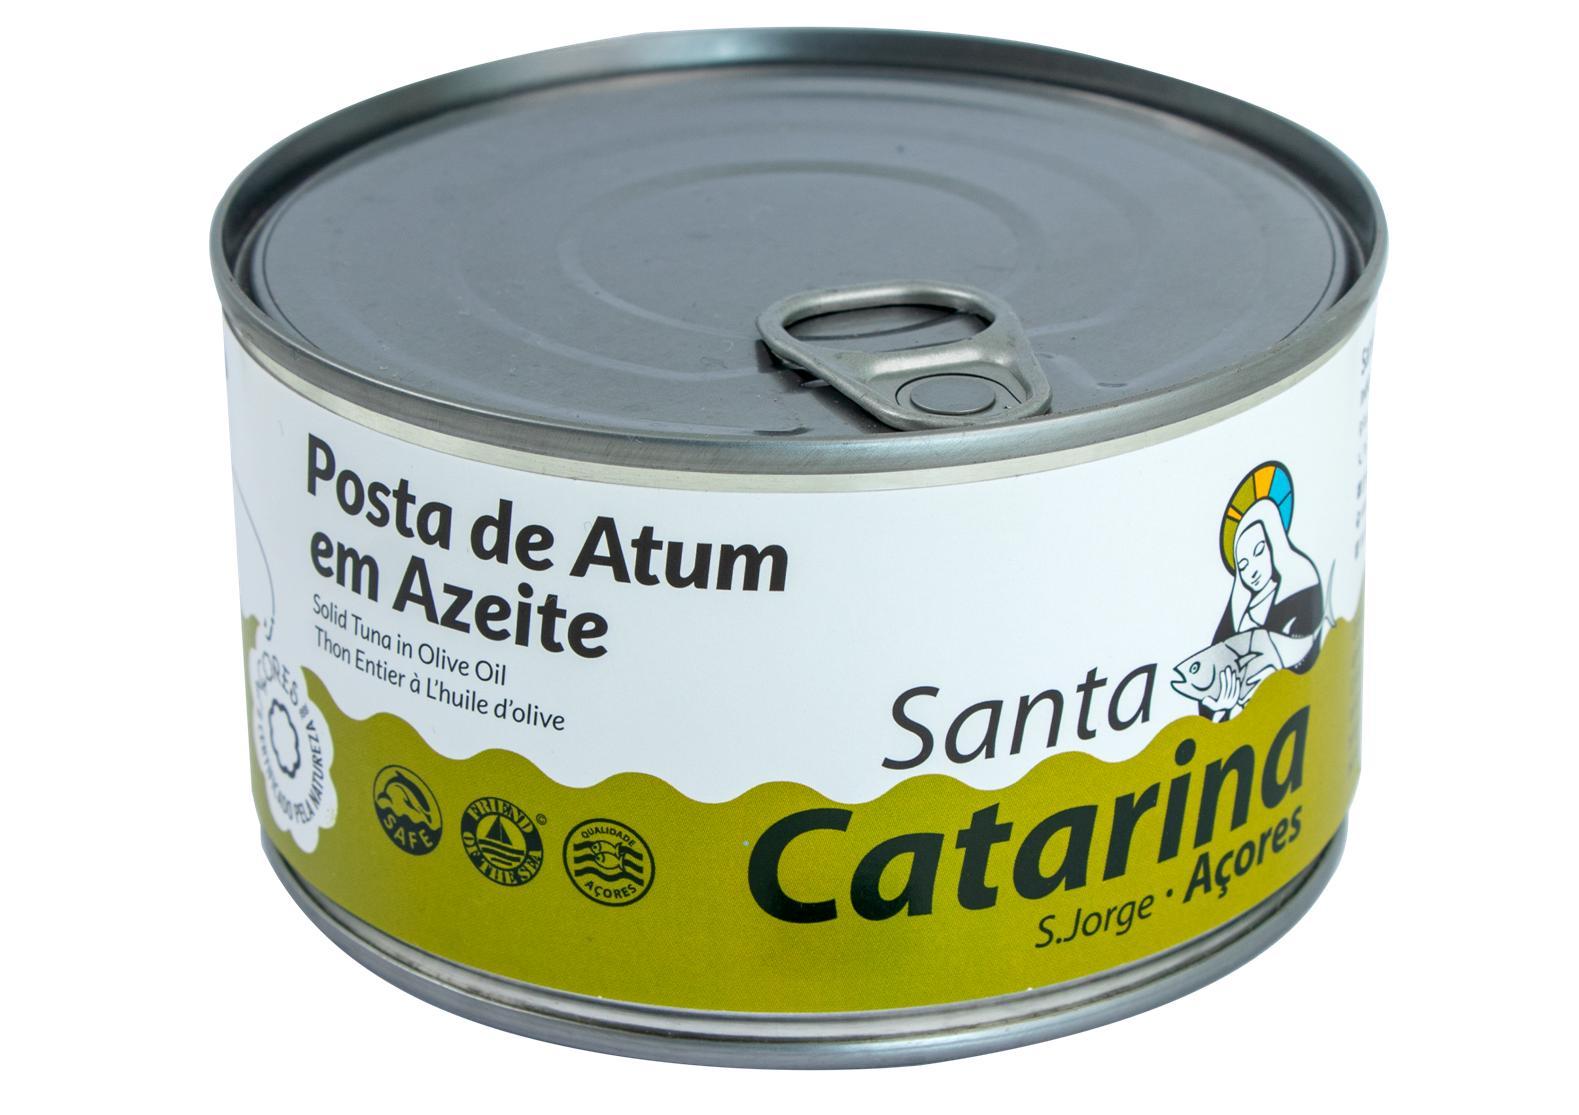 Darne de thon des Açores à l'huile d'olive - Santa Catarina - Conserves de thon bonito des Açores